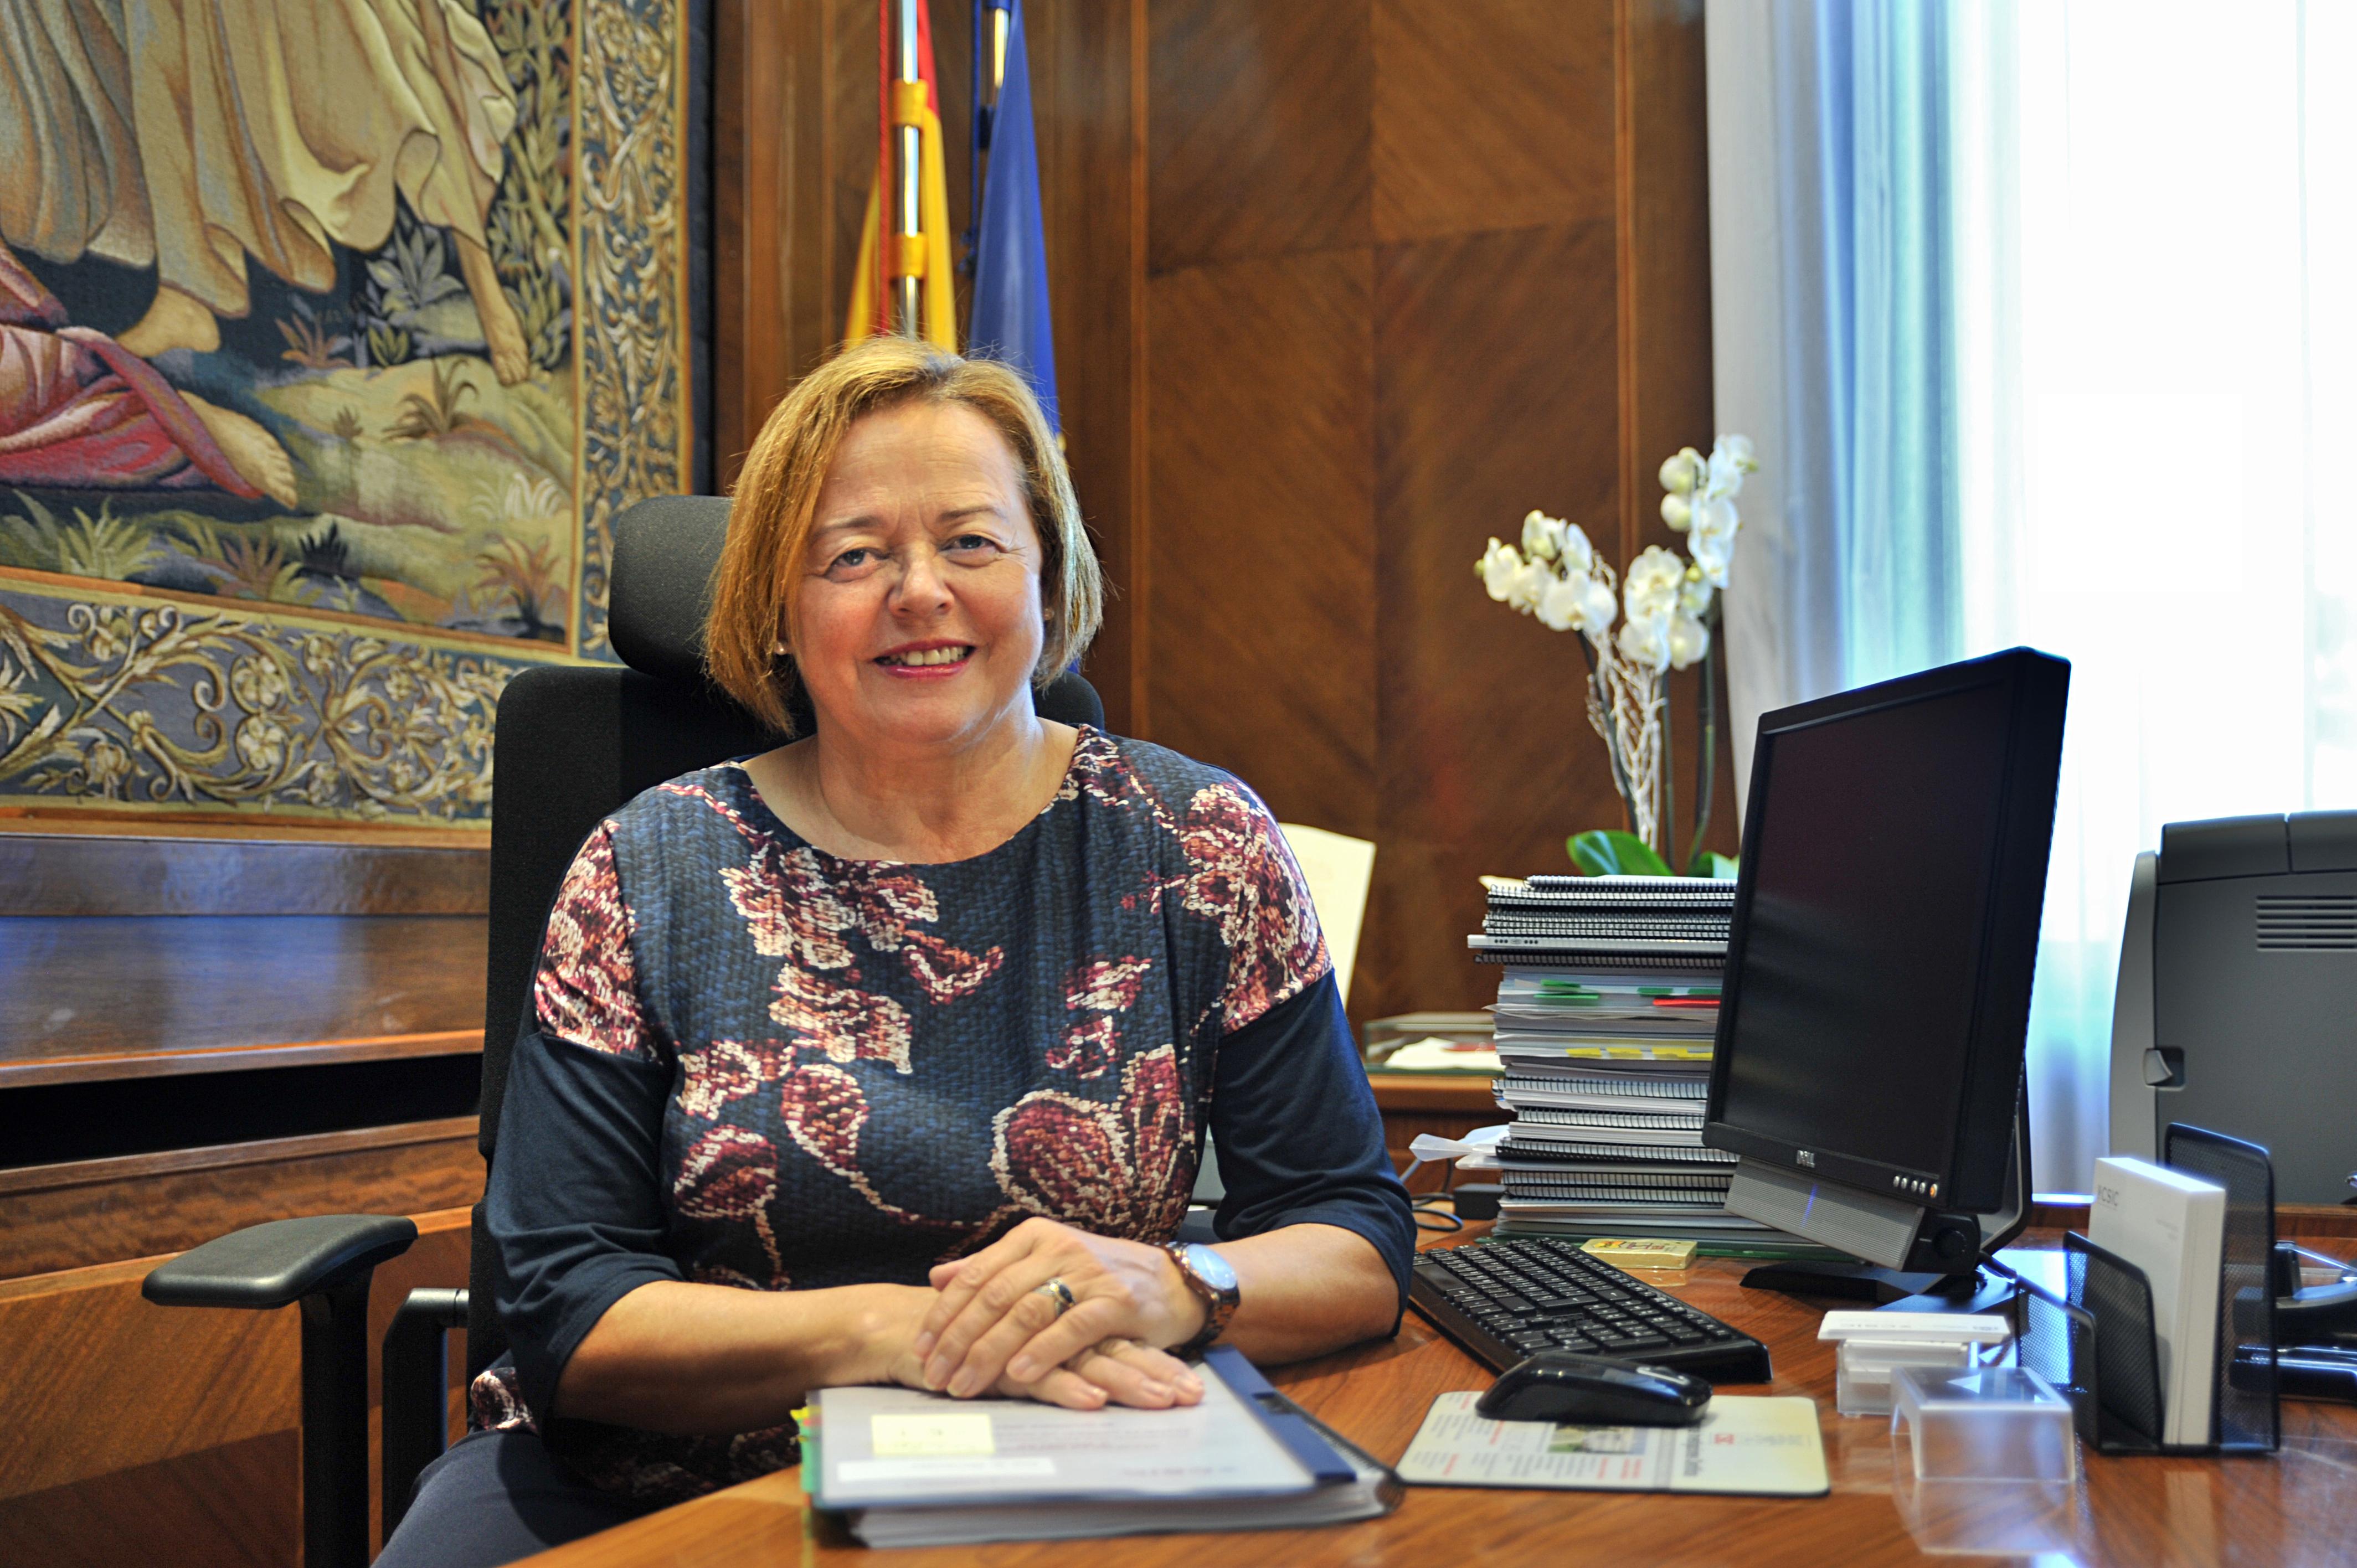 imagen de La presidenta del CSIC, Rosa Menéndez. / CSIC Comunicación